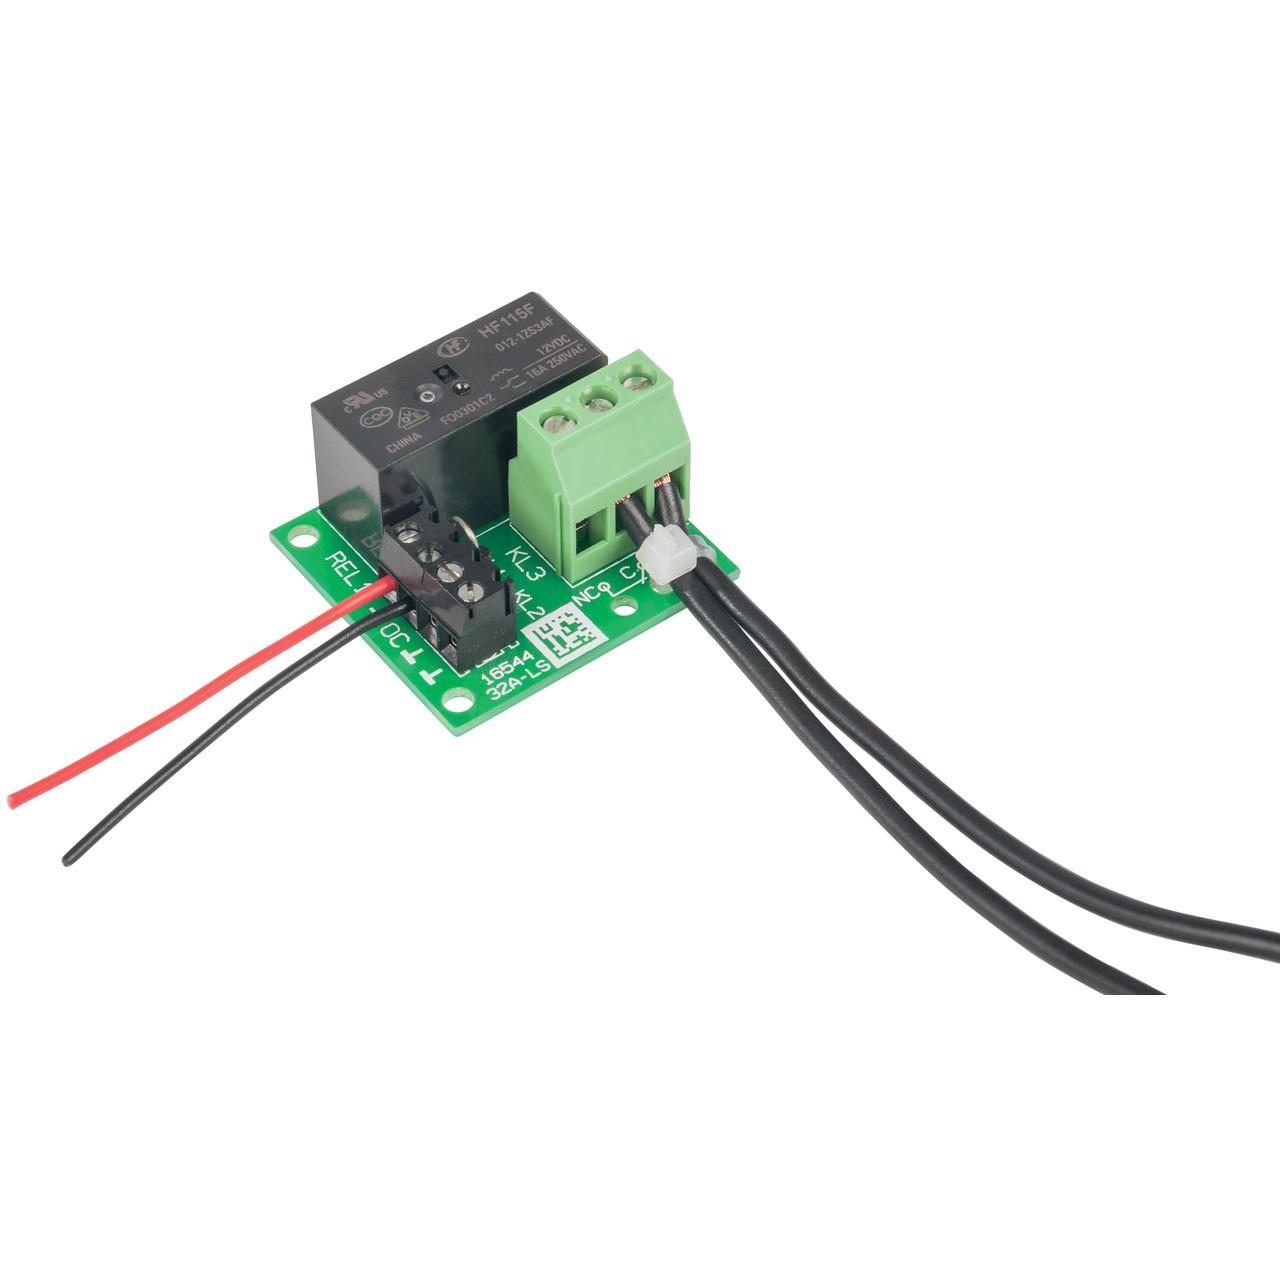 ELV Bausatz Relais-Schaltmodul RSM1